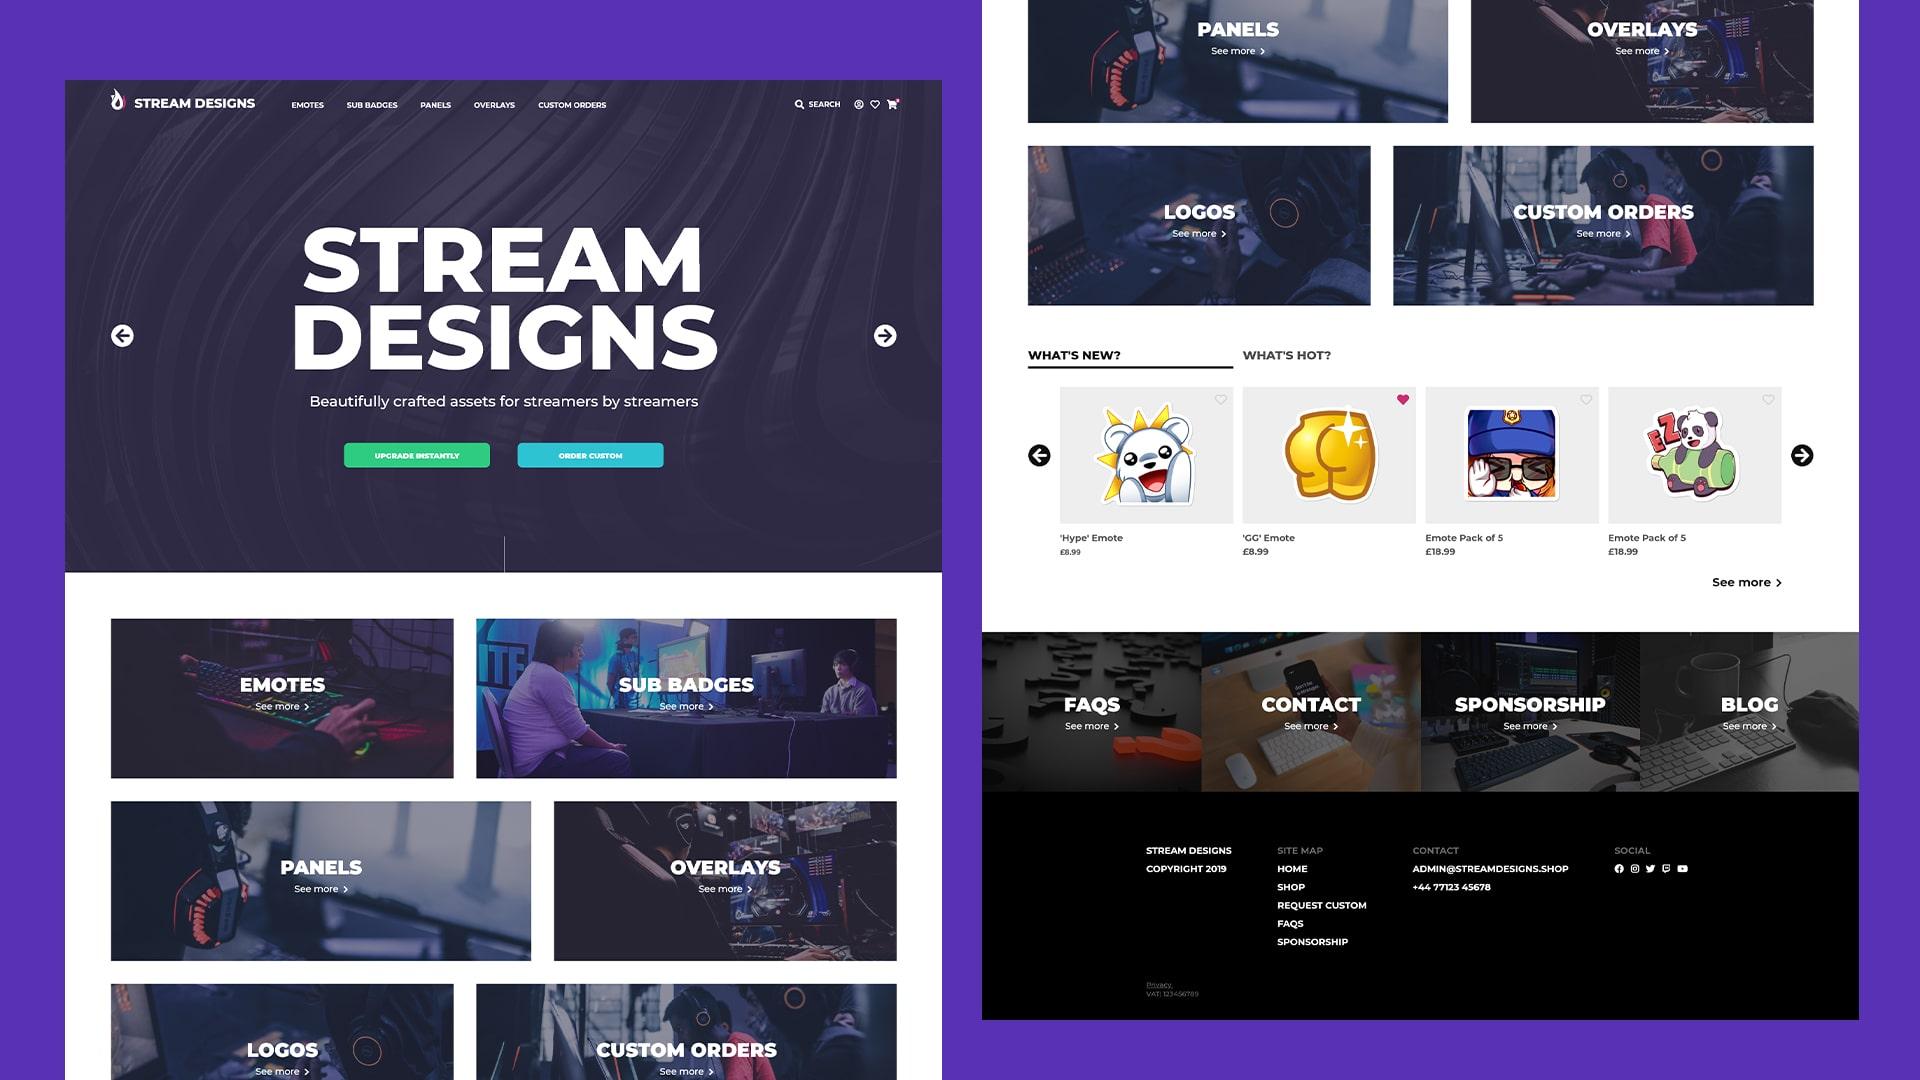 Stream designs desktop site